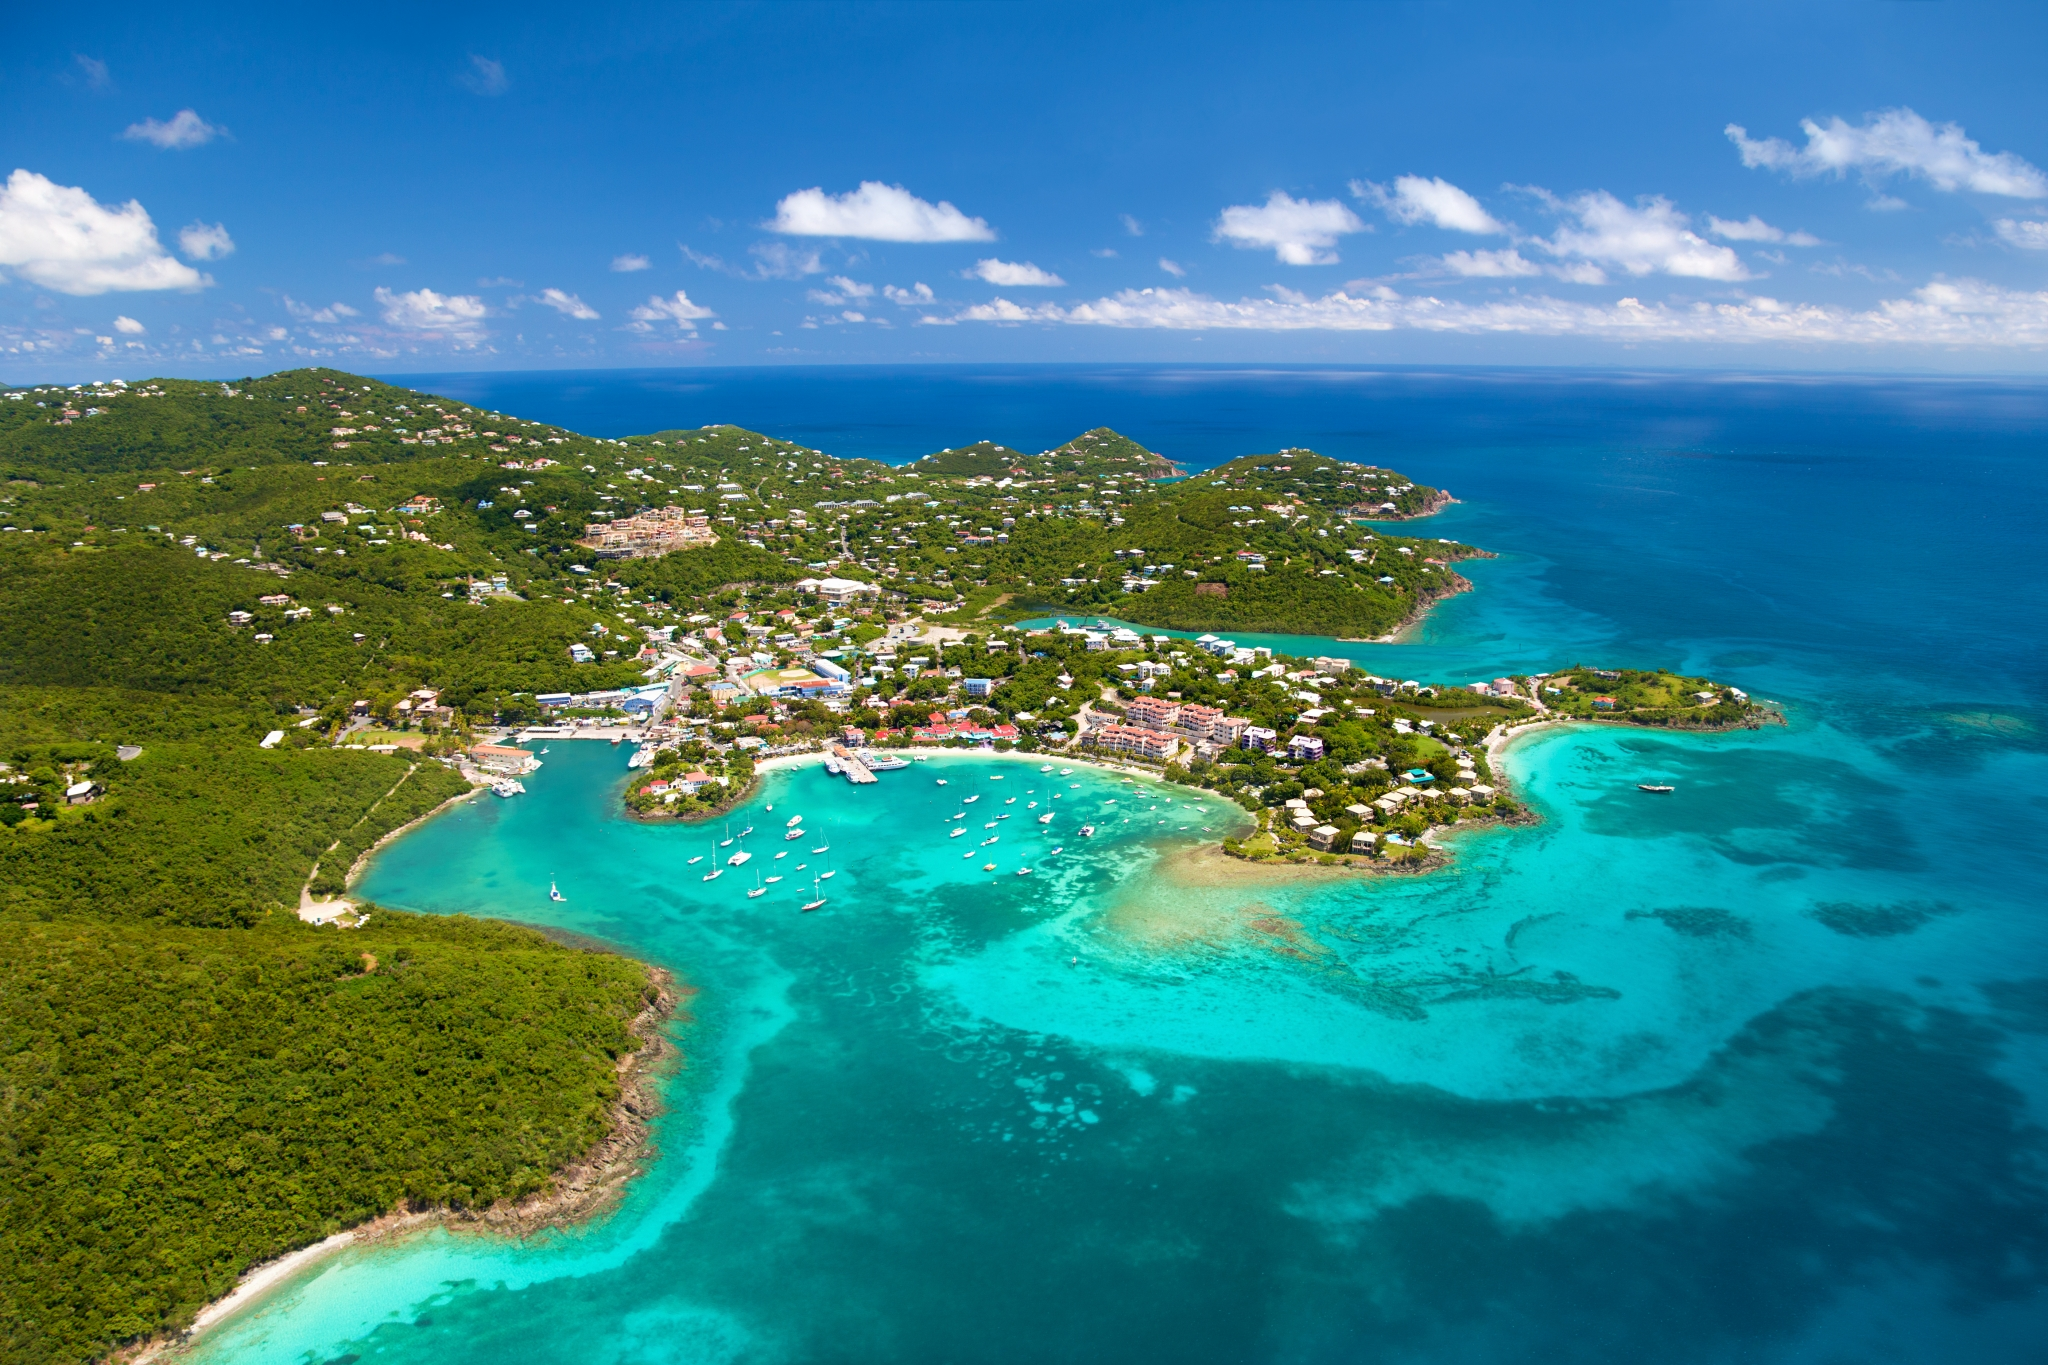 Man missing since June on St Croix - The Virgin Islands